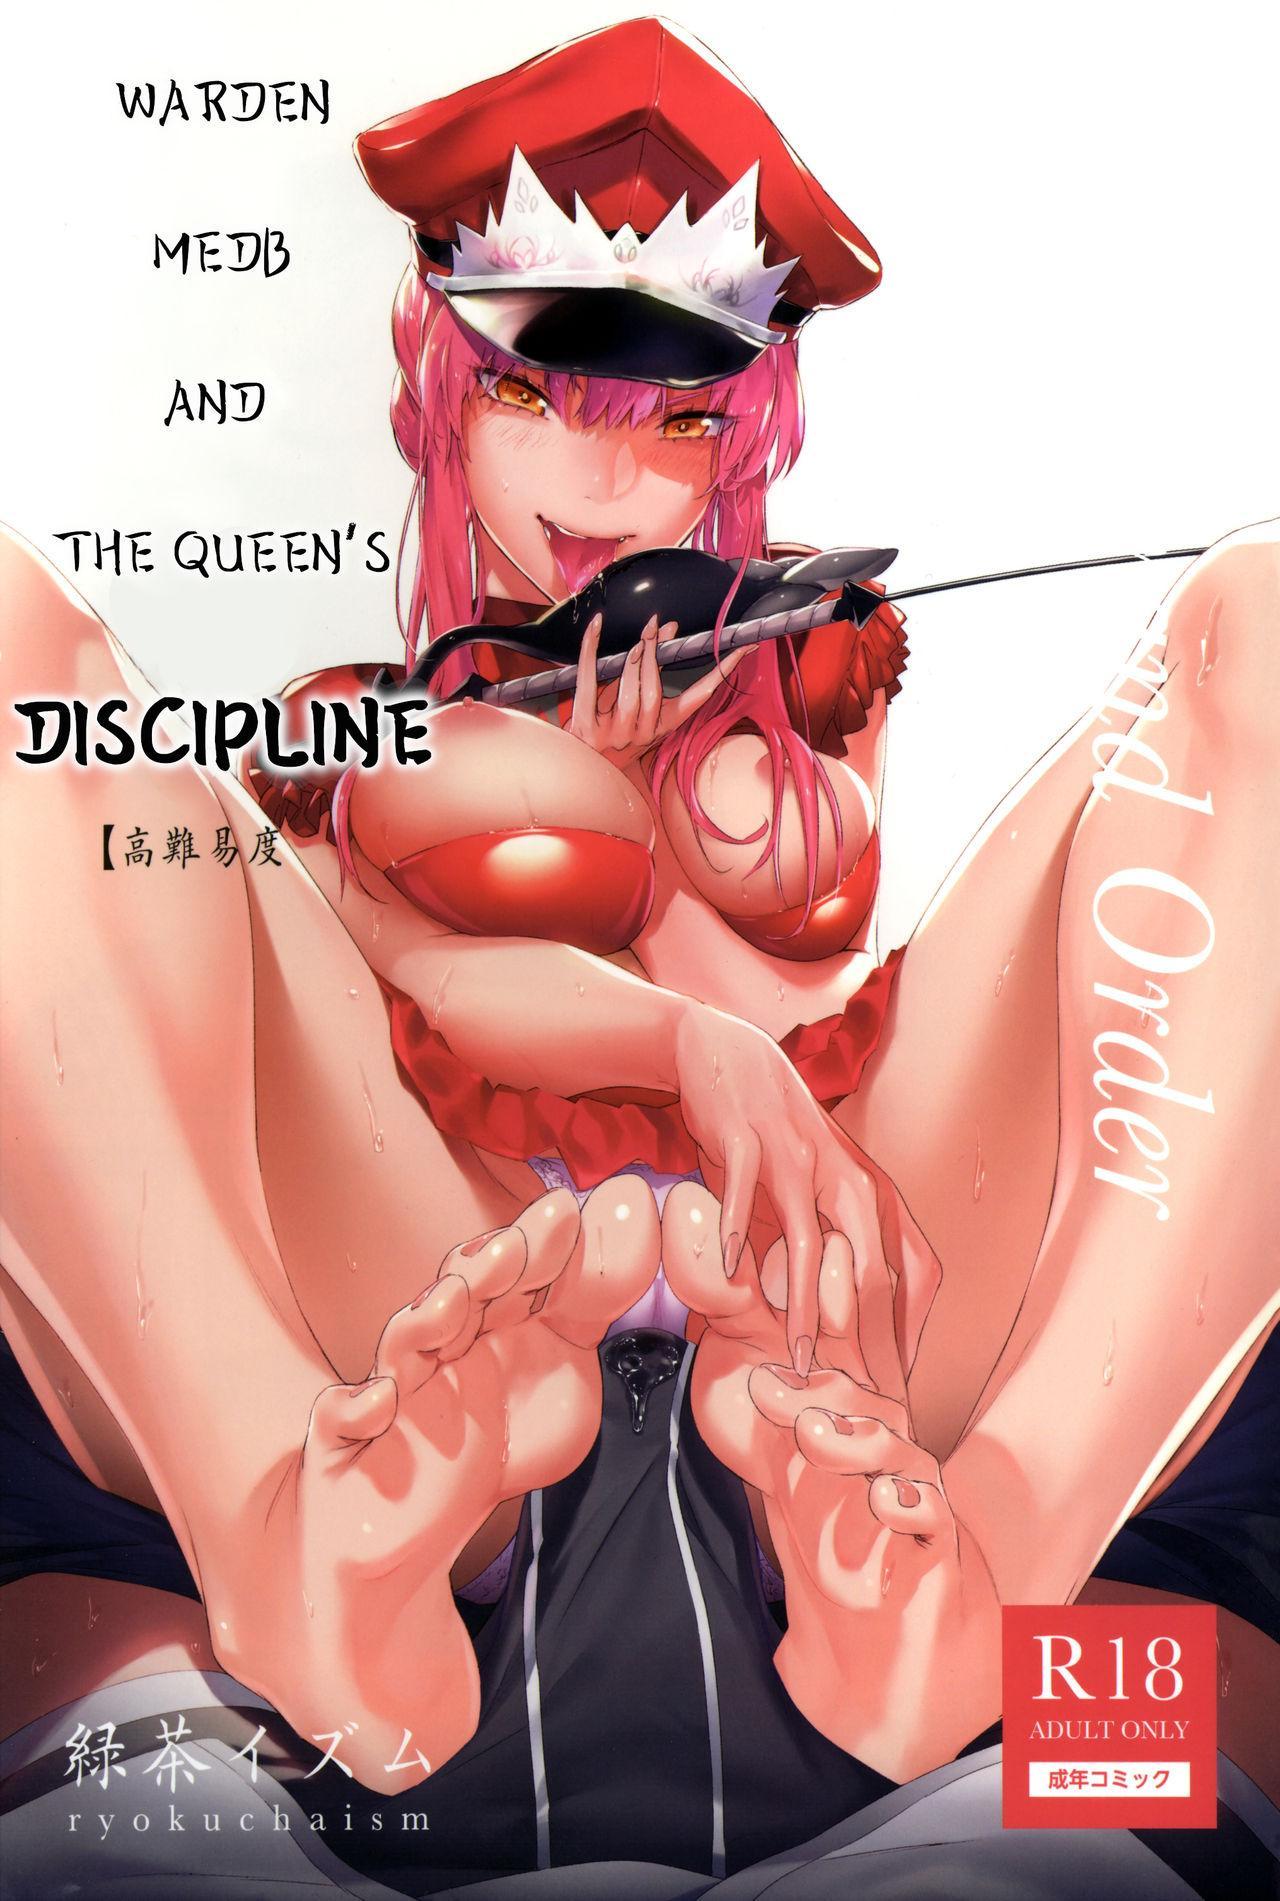 Gokuchou Medb to Joou no Shitsuke | Warden Medb and The Queen's Discipline 0